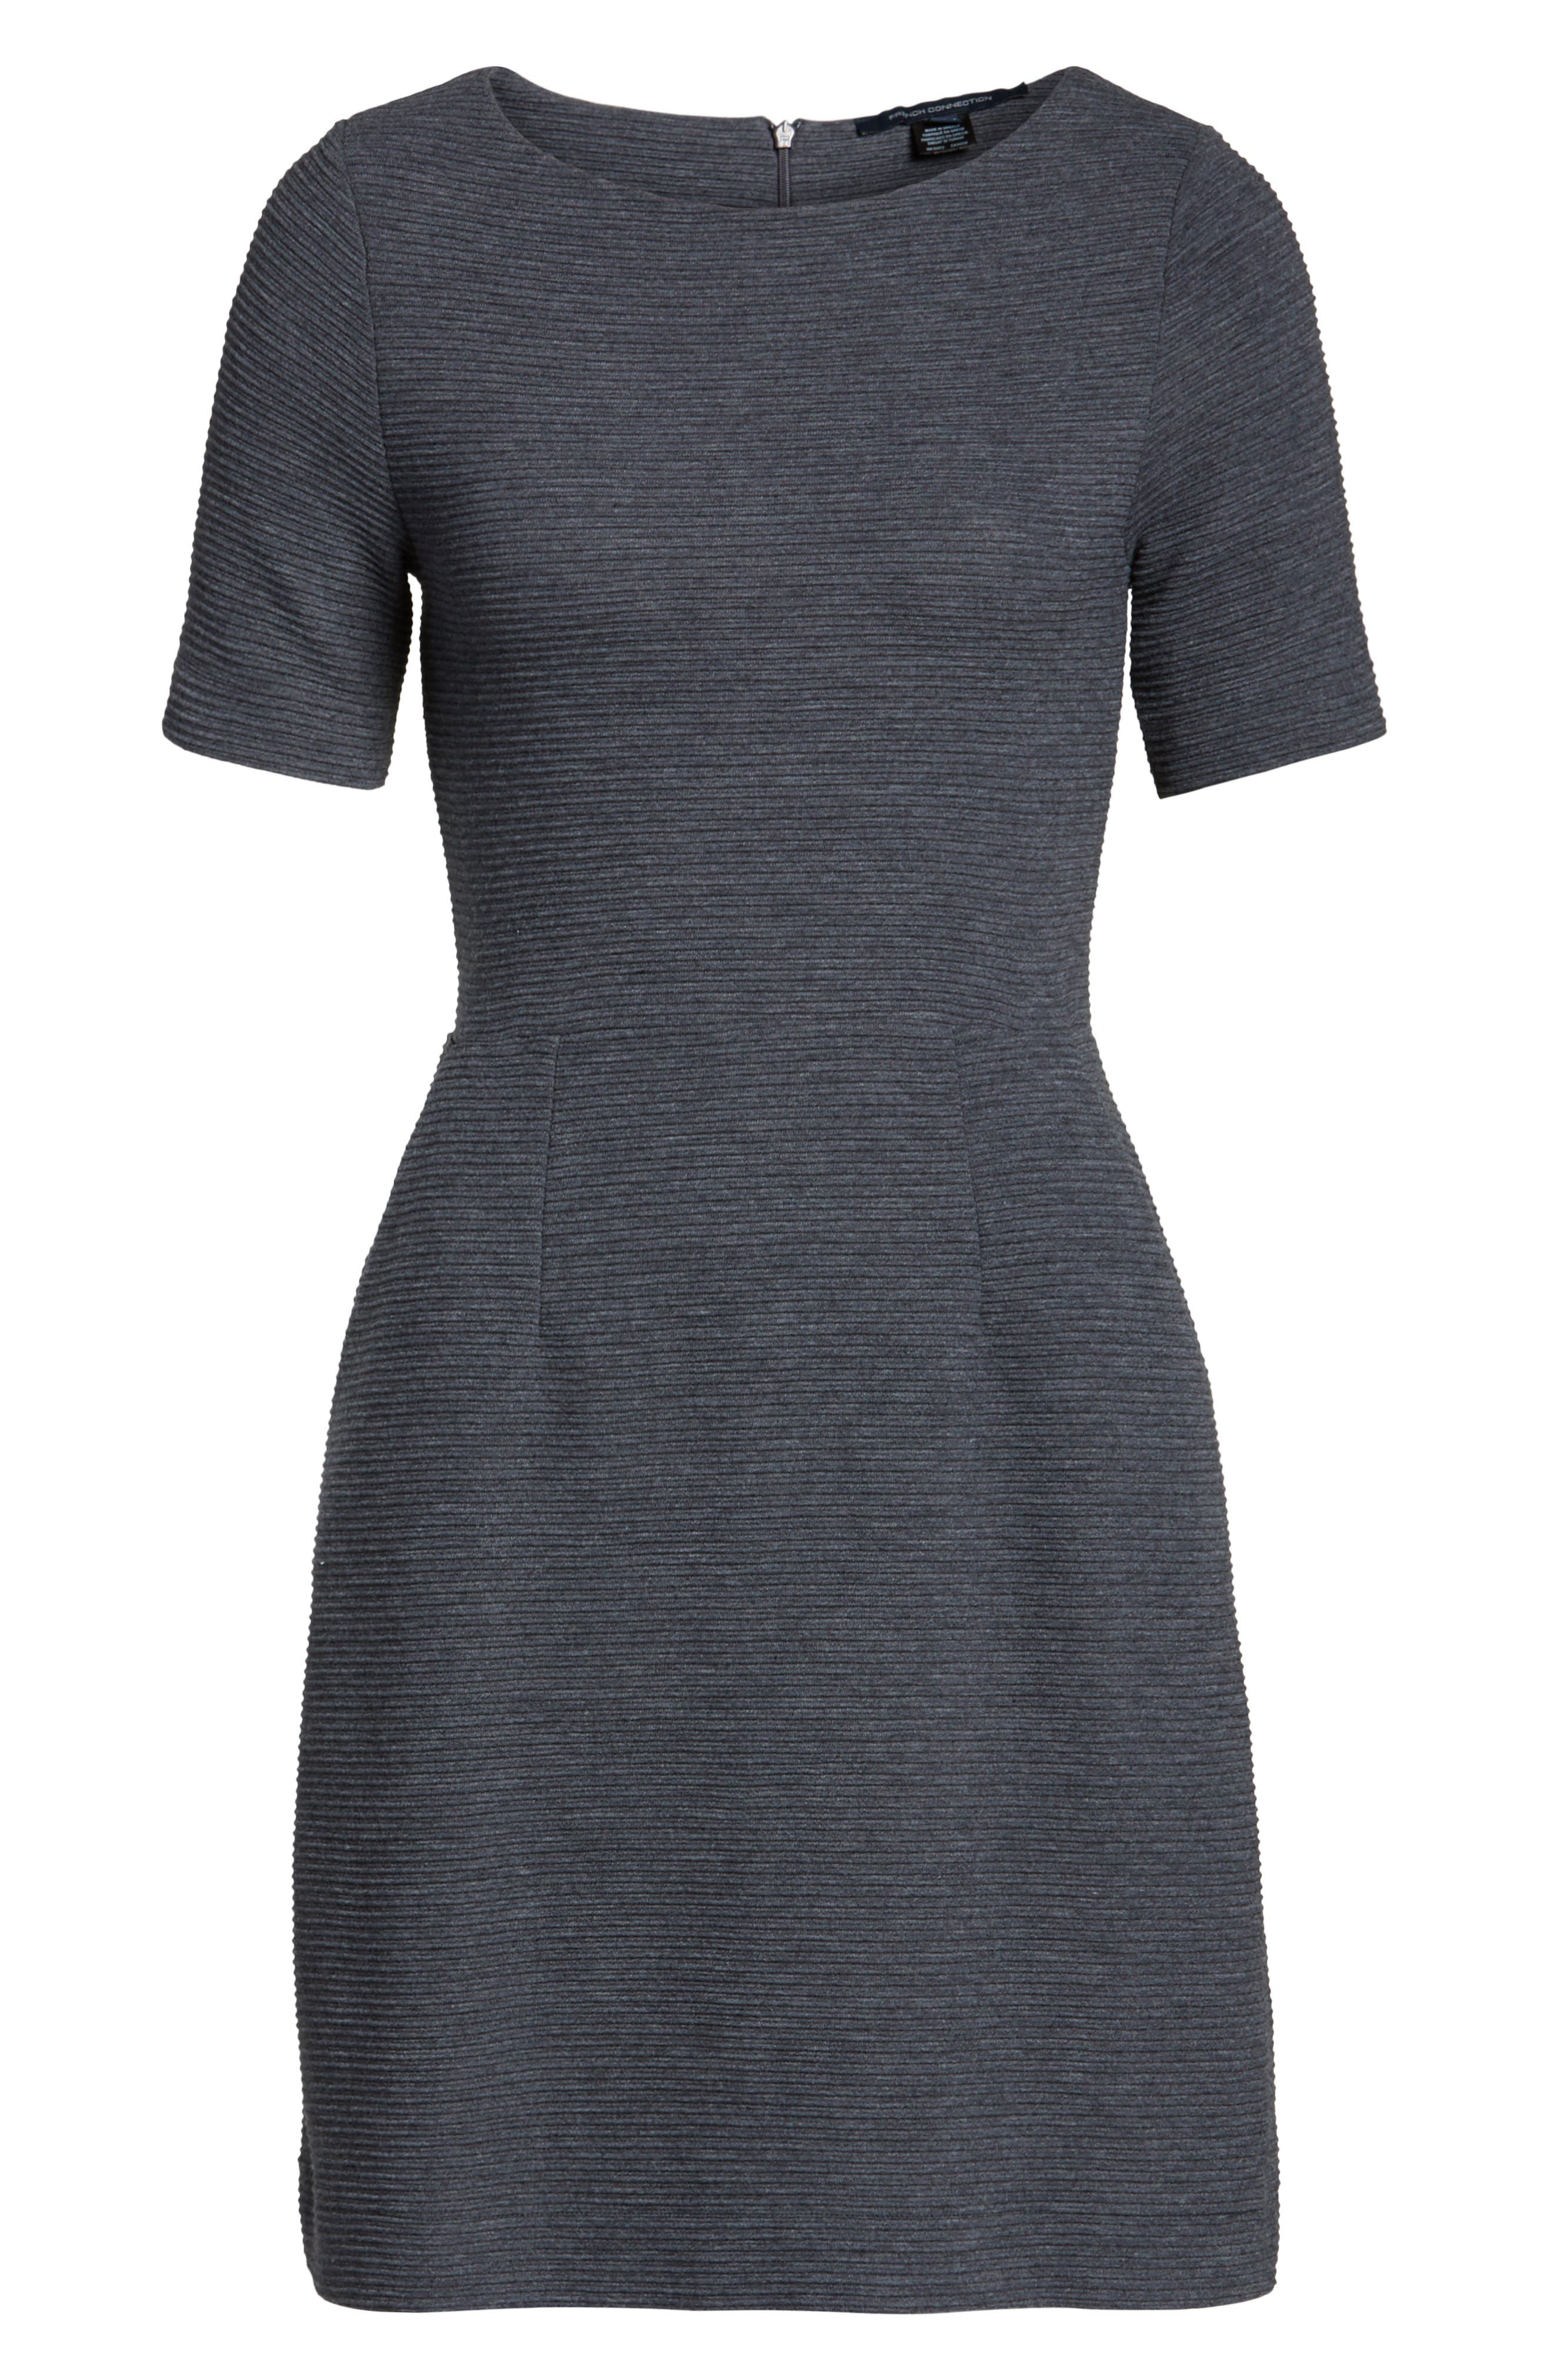 Sudan Fit & Flare Dress,                         Main,                         color, Dark Grey